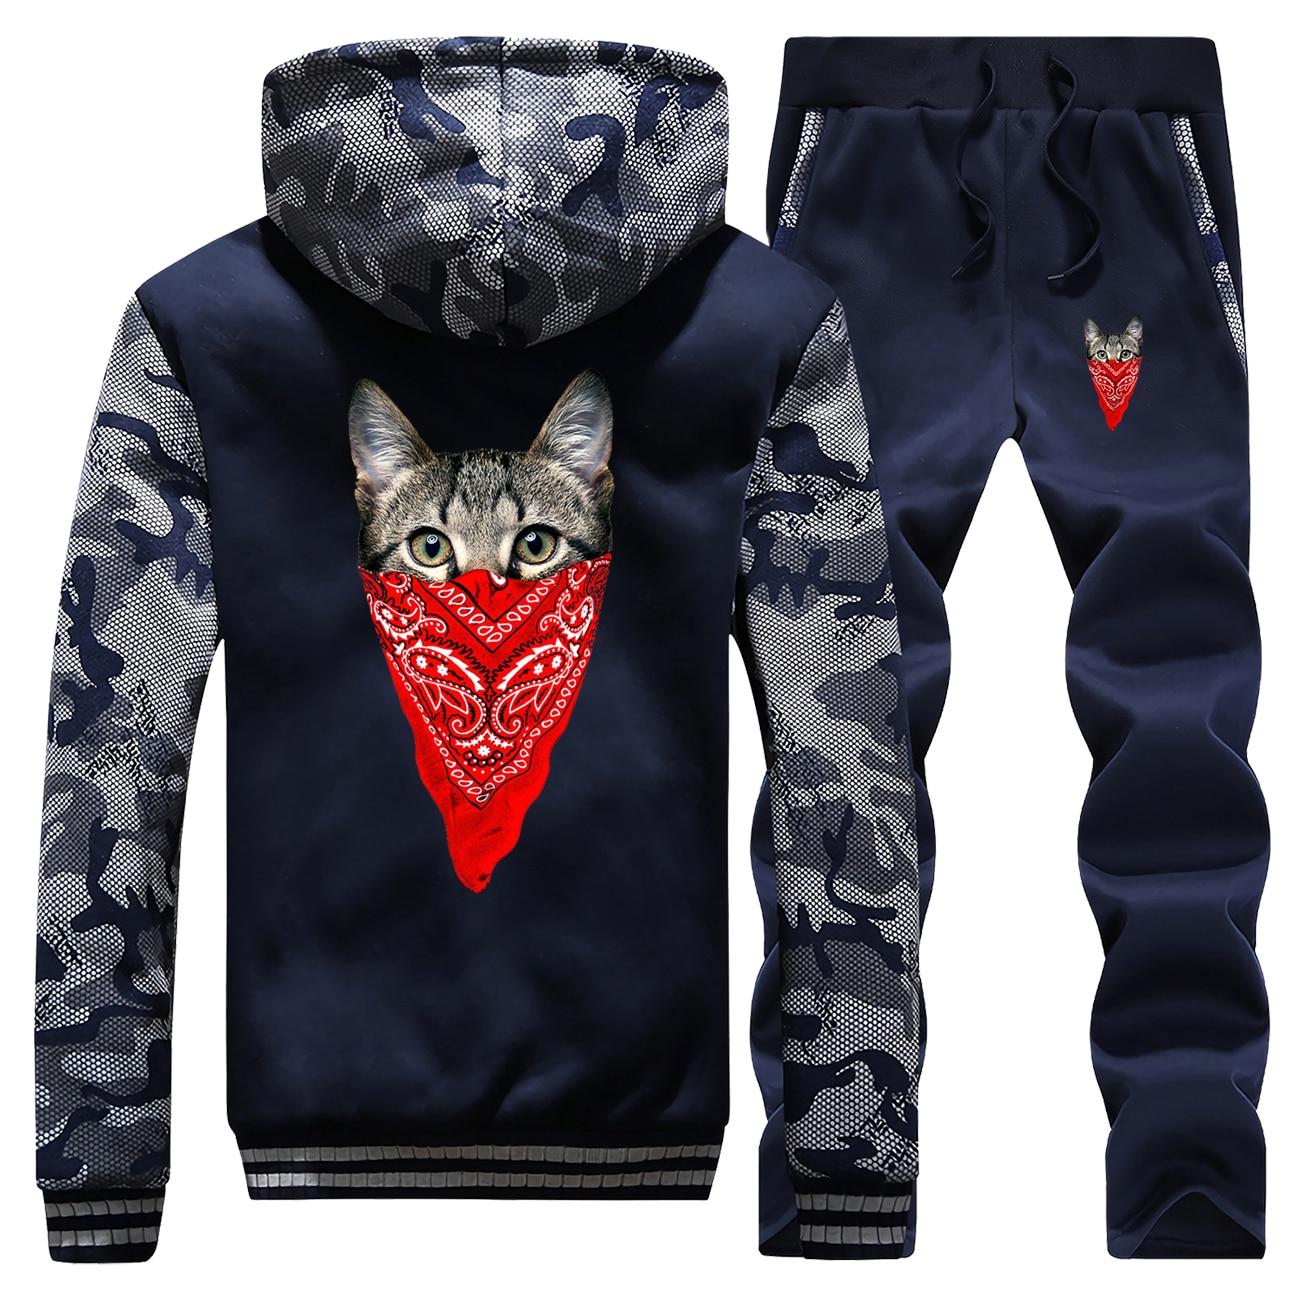 Fashion Mens Animal Camo Fleece Hoodies Pant Sets Funny The Masked Cat Knight Cat Sweatshirt Men Casual Sportswear Tracksuit